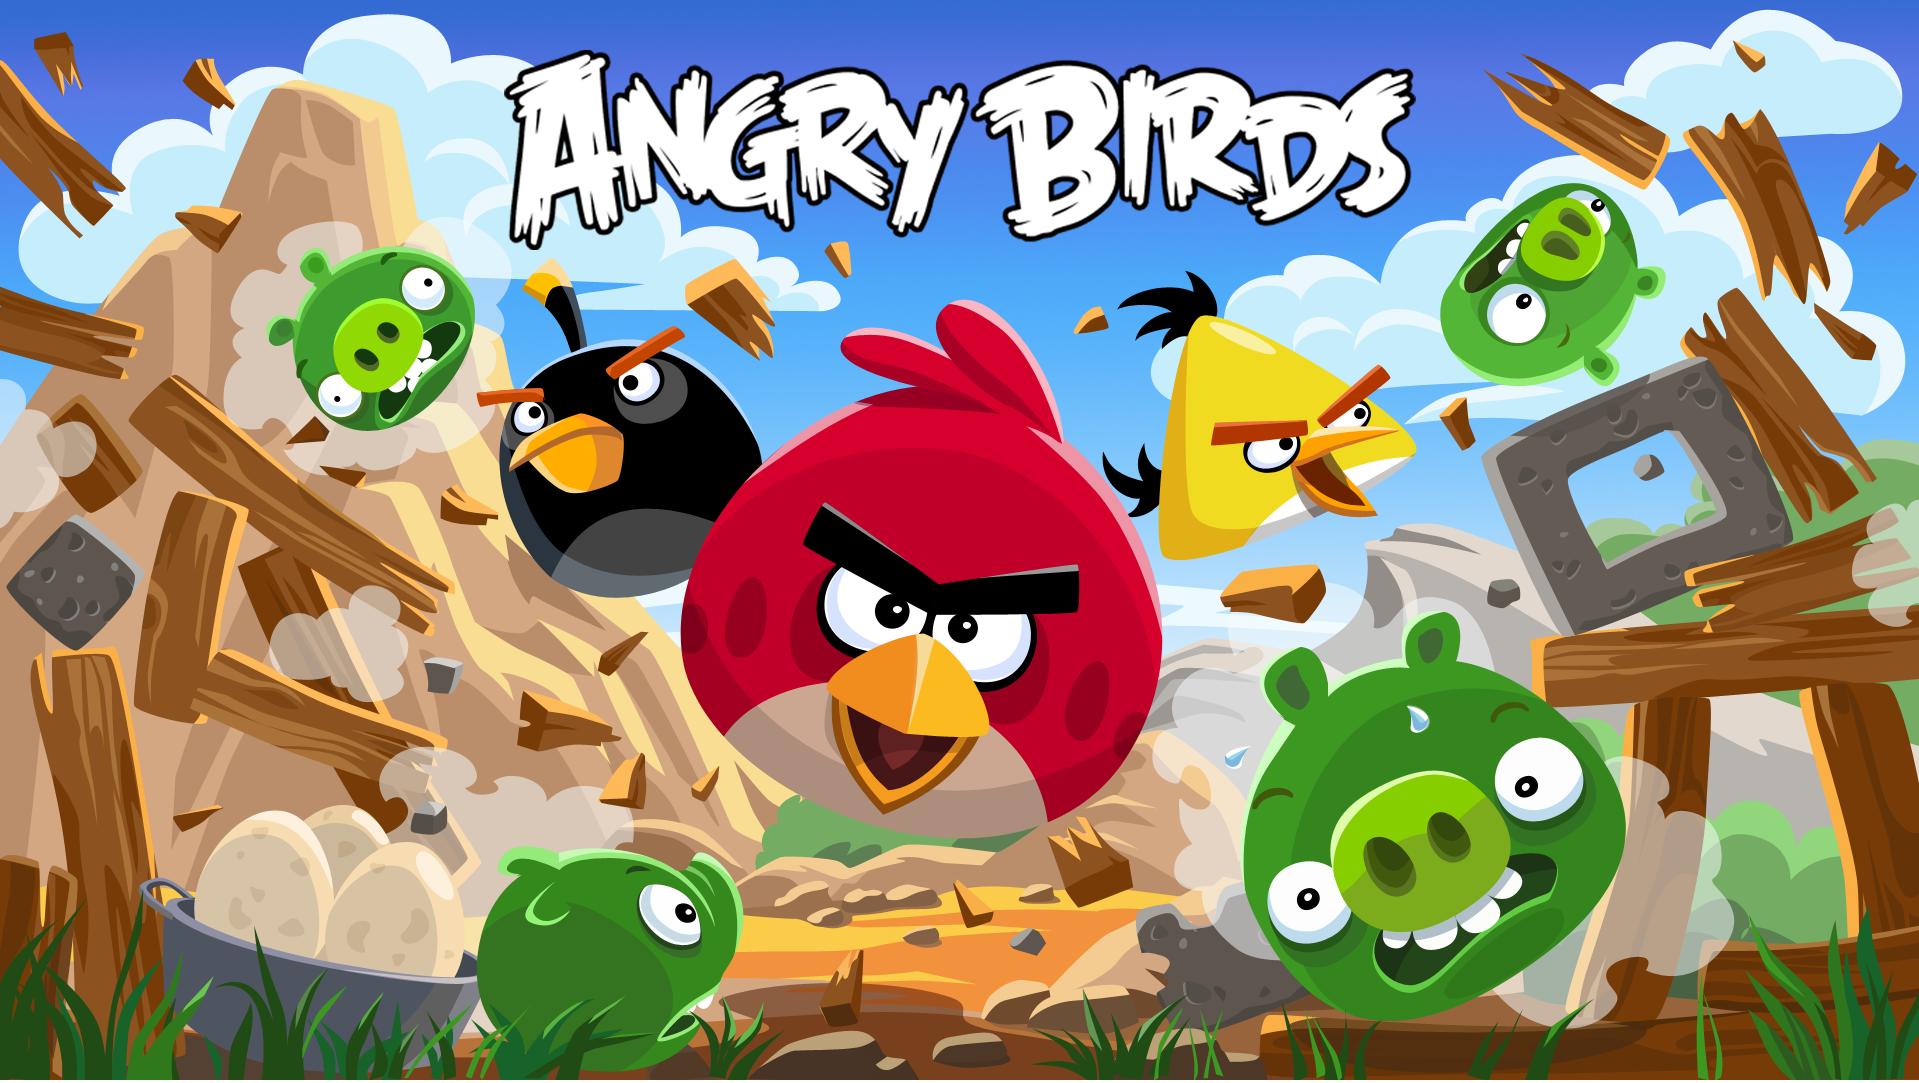 Kartun angry bird yang dikenal di kalangan anak-anak dan remaja.